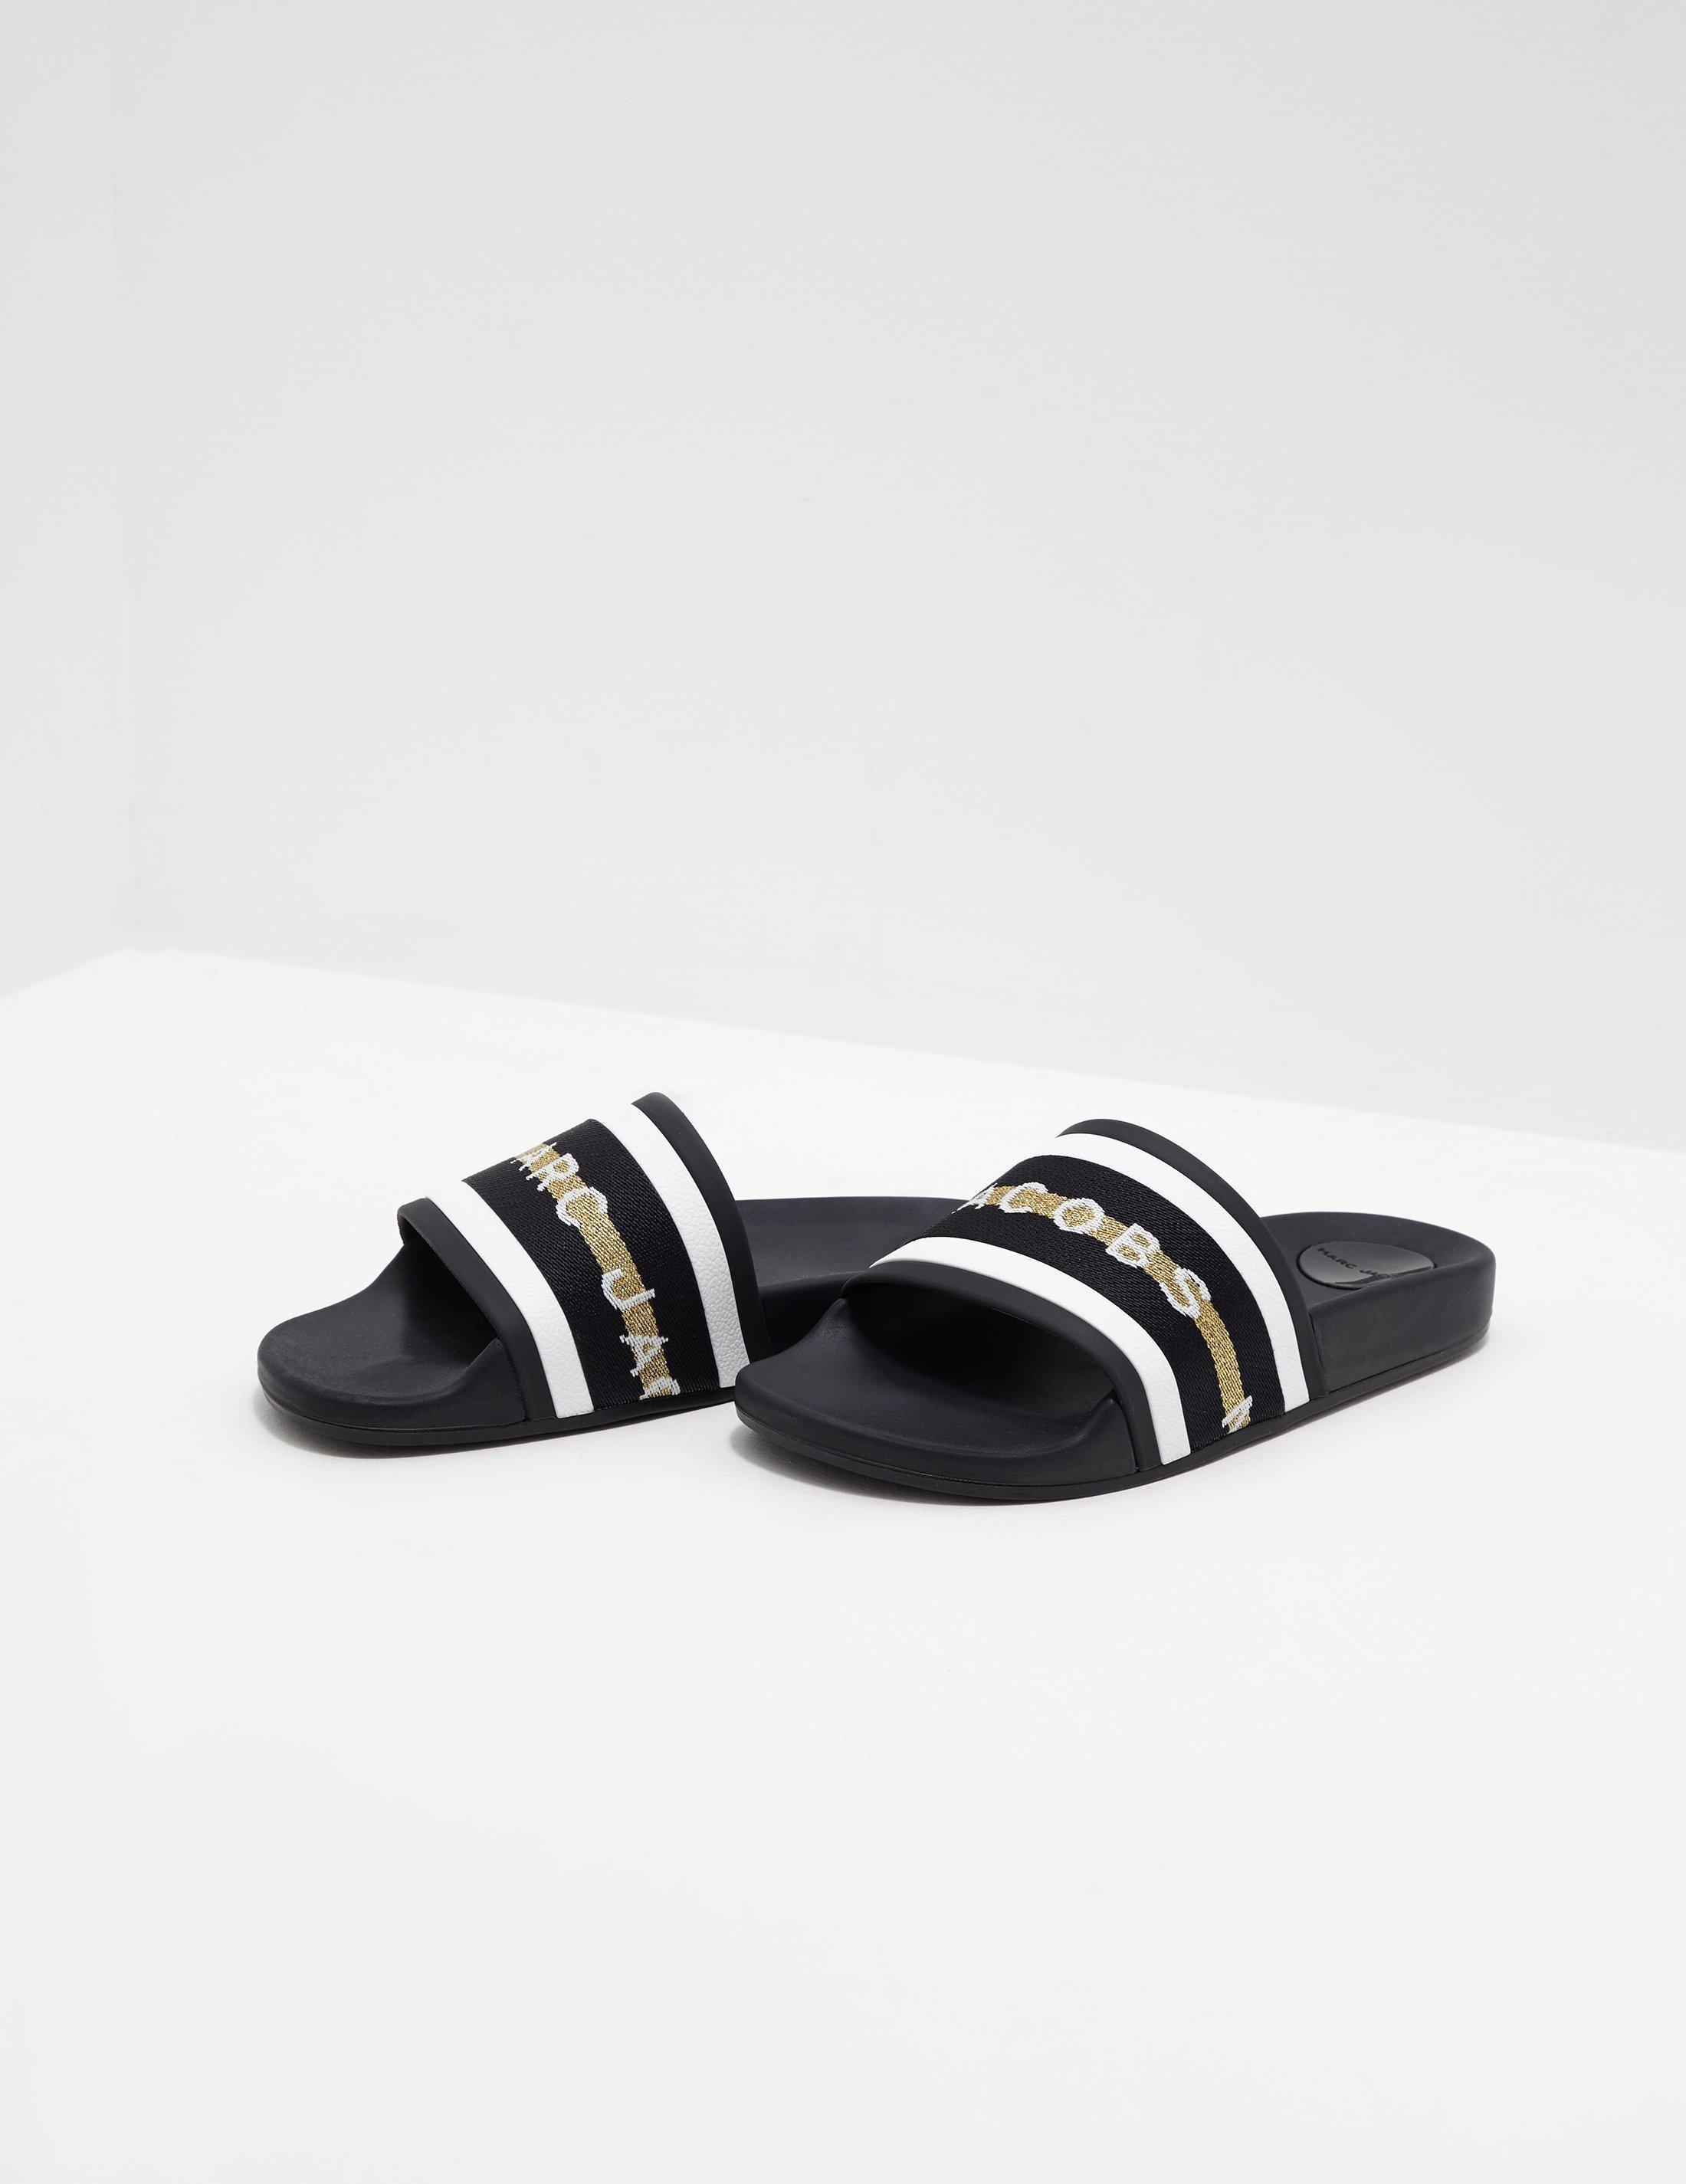 711b901905e1 Marc Jacobs - Womens Cooper Slides Black - Lyst. View fullscreen